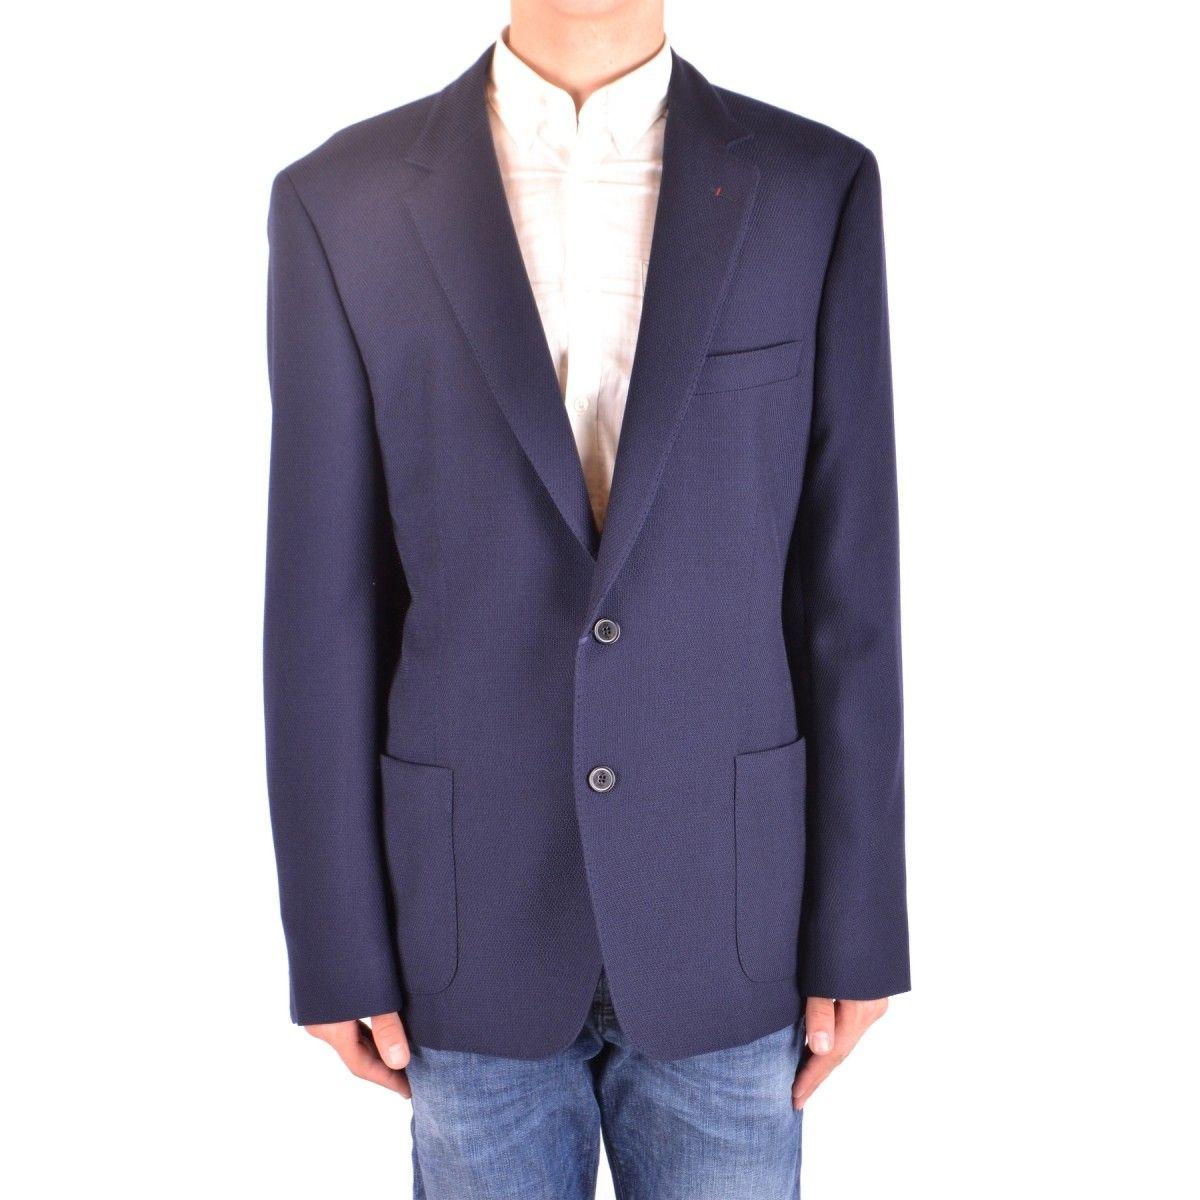 fay men's wool blue jacket glamtop